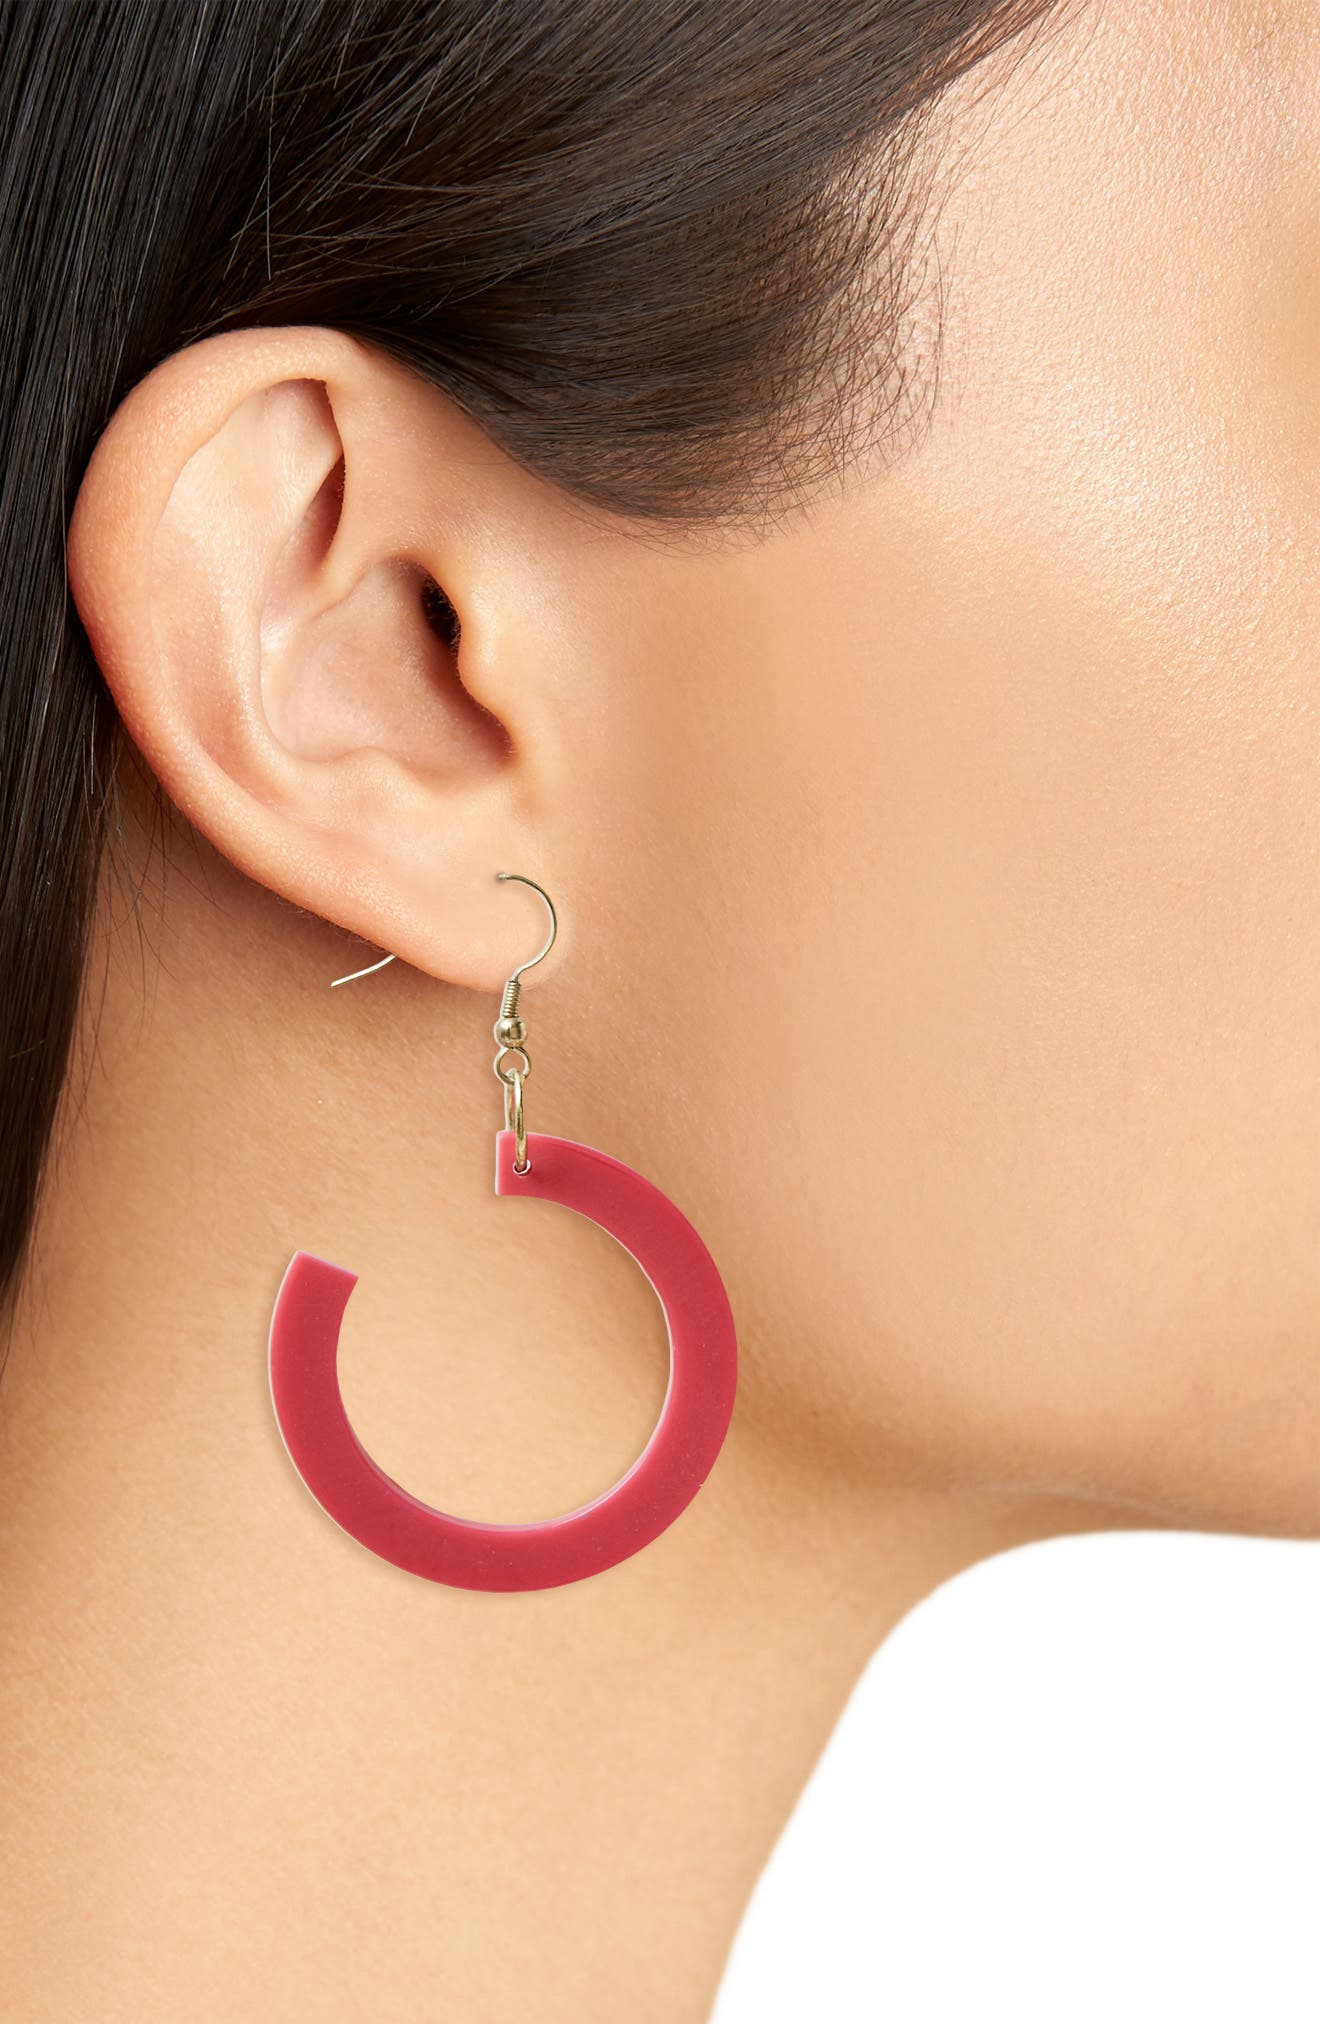 Reef Earrings,                             Alternate thumbnail 2, color,                             Fuschia